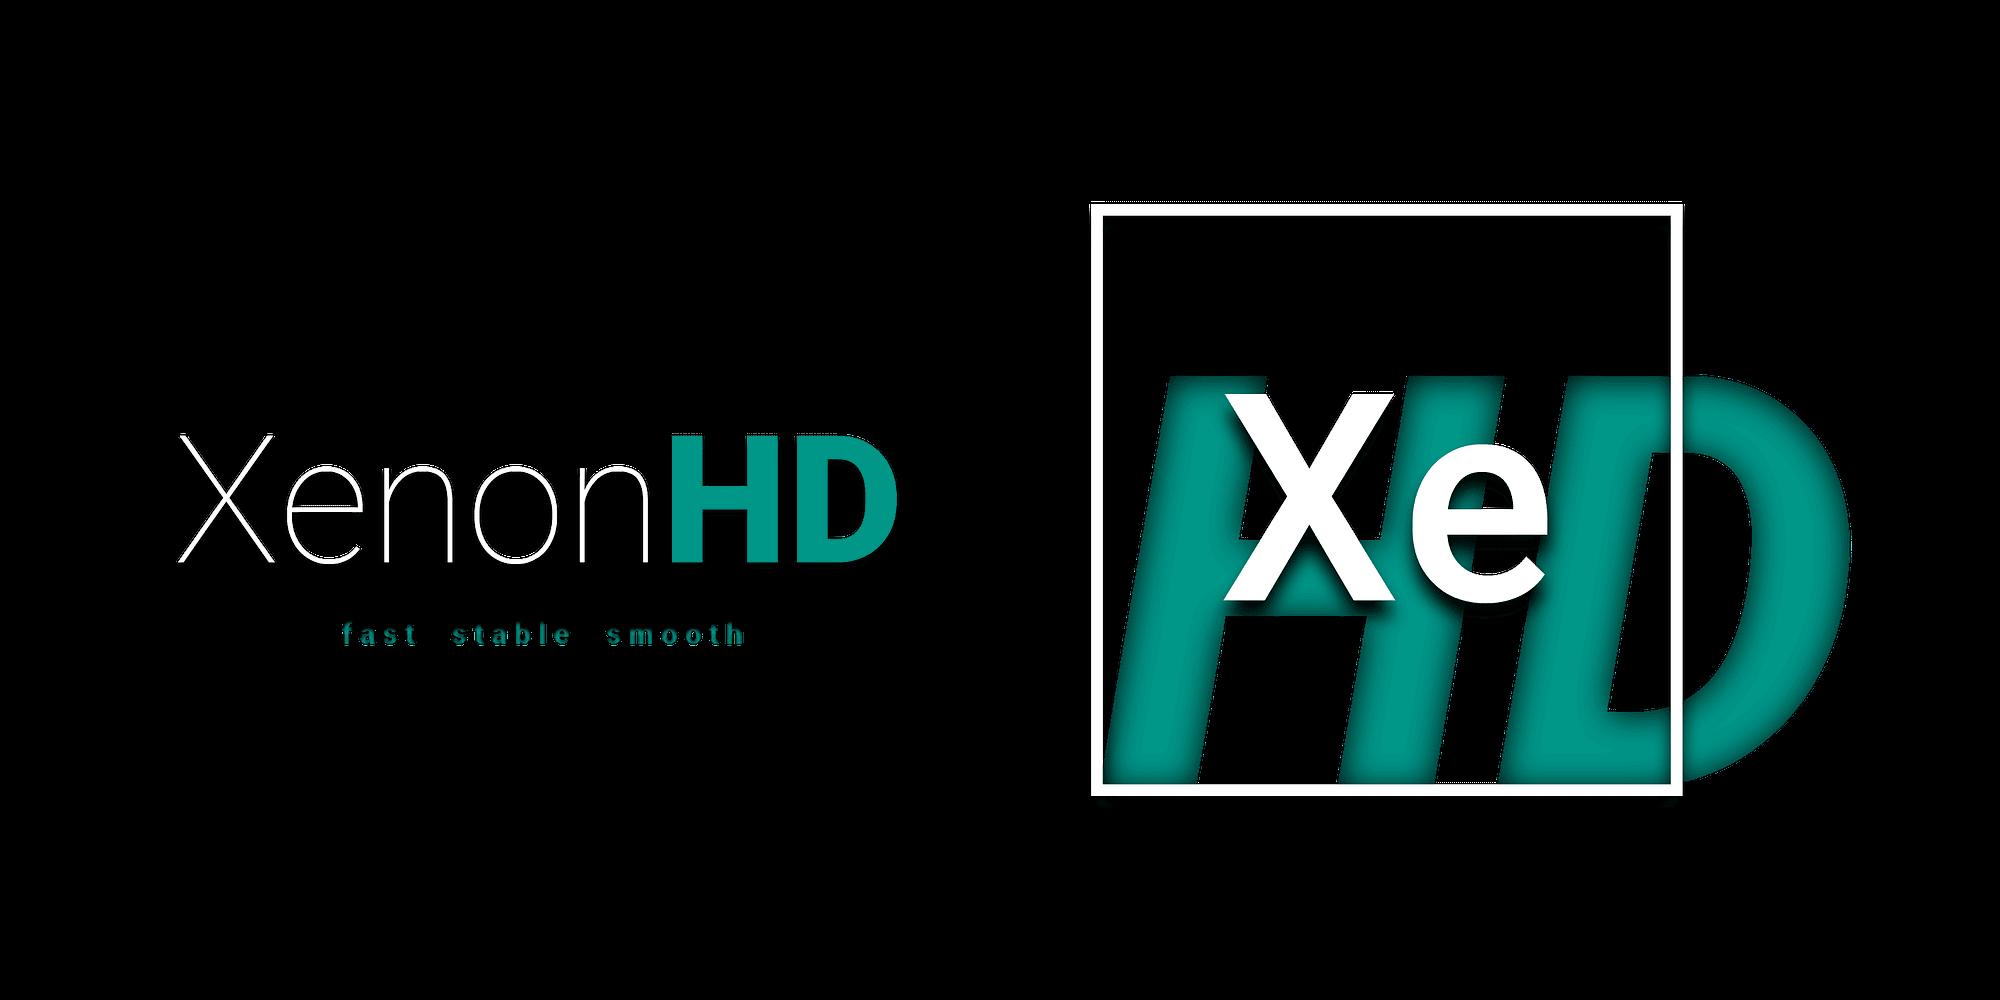 Custom Rom for Android - XenonHD ROM